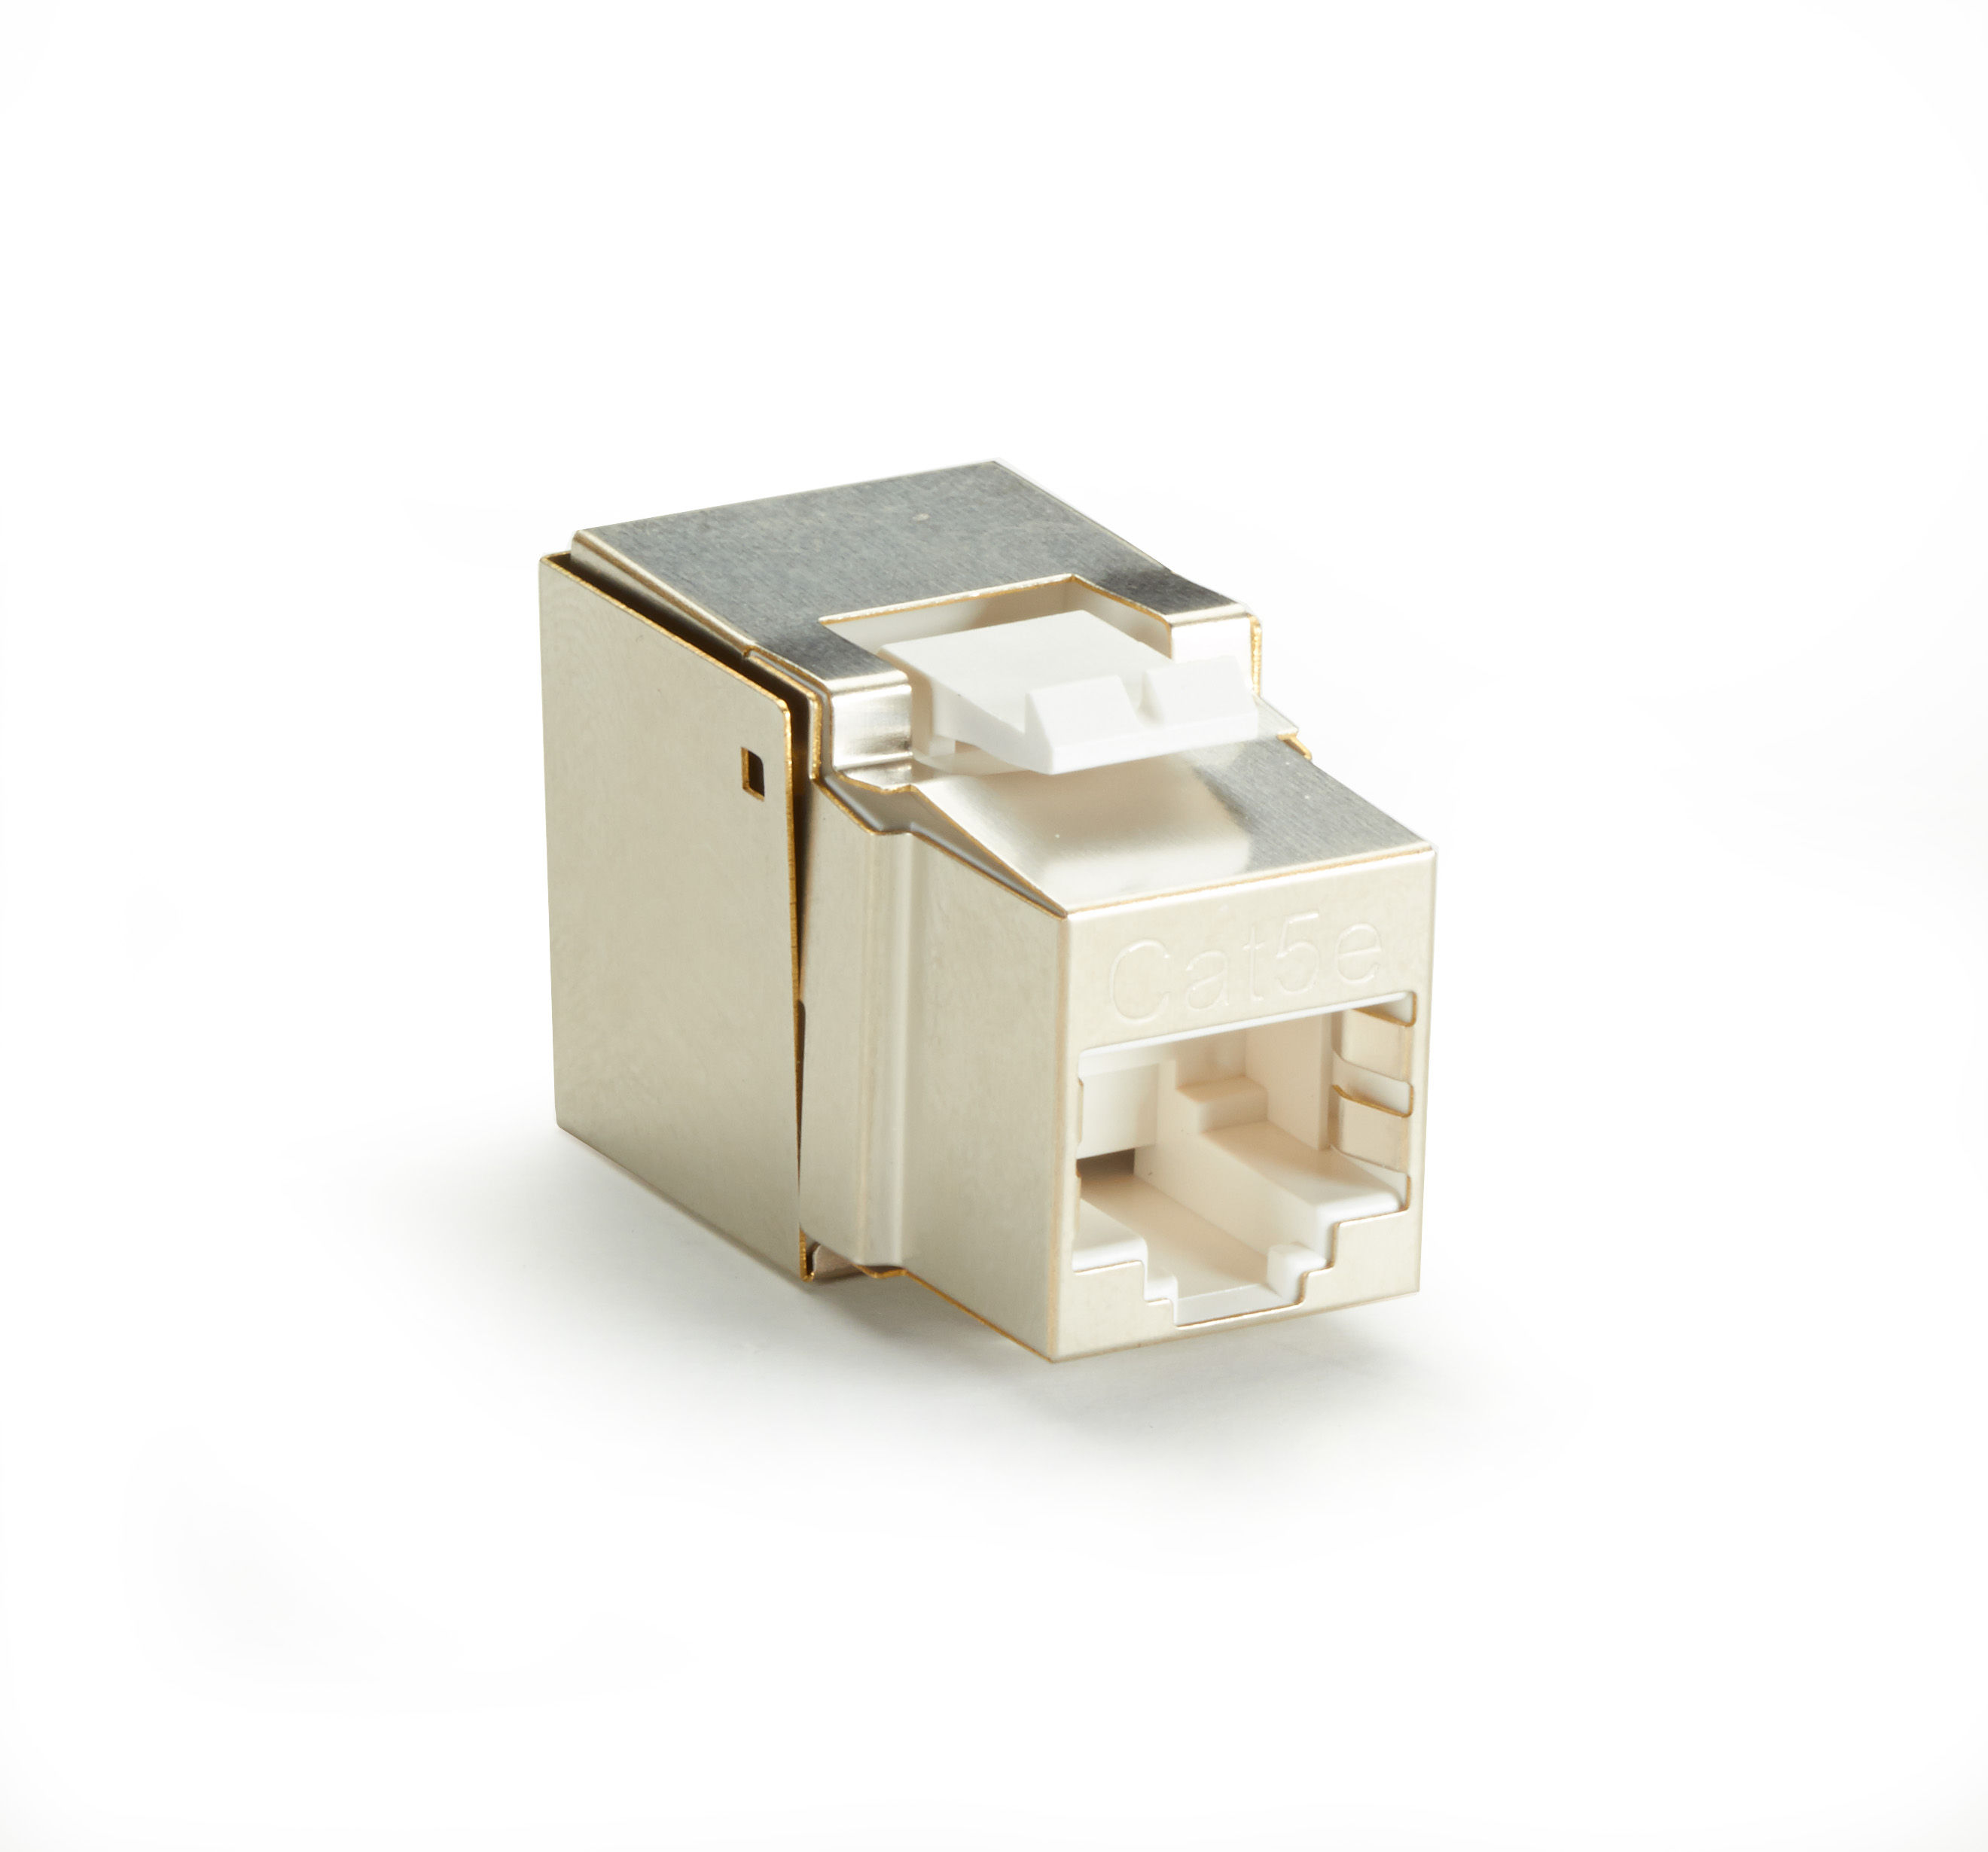 Cat5e Shielded Keystone Jack Black Box Wiring Diagram Schematic Additional Product Image